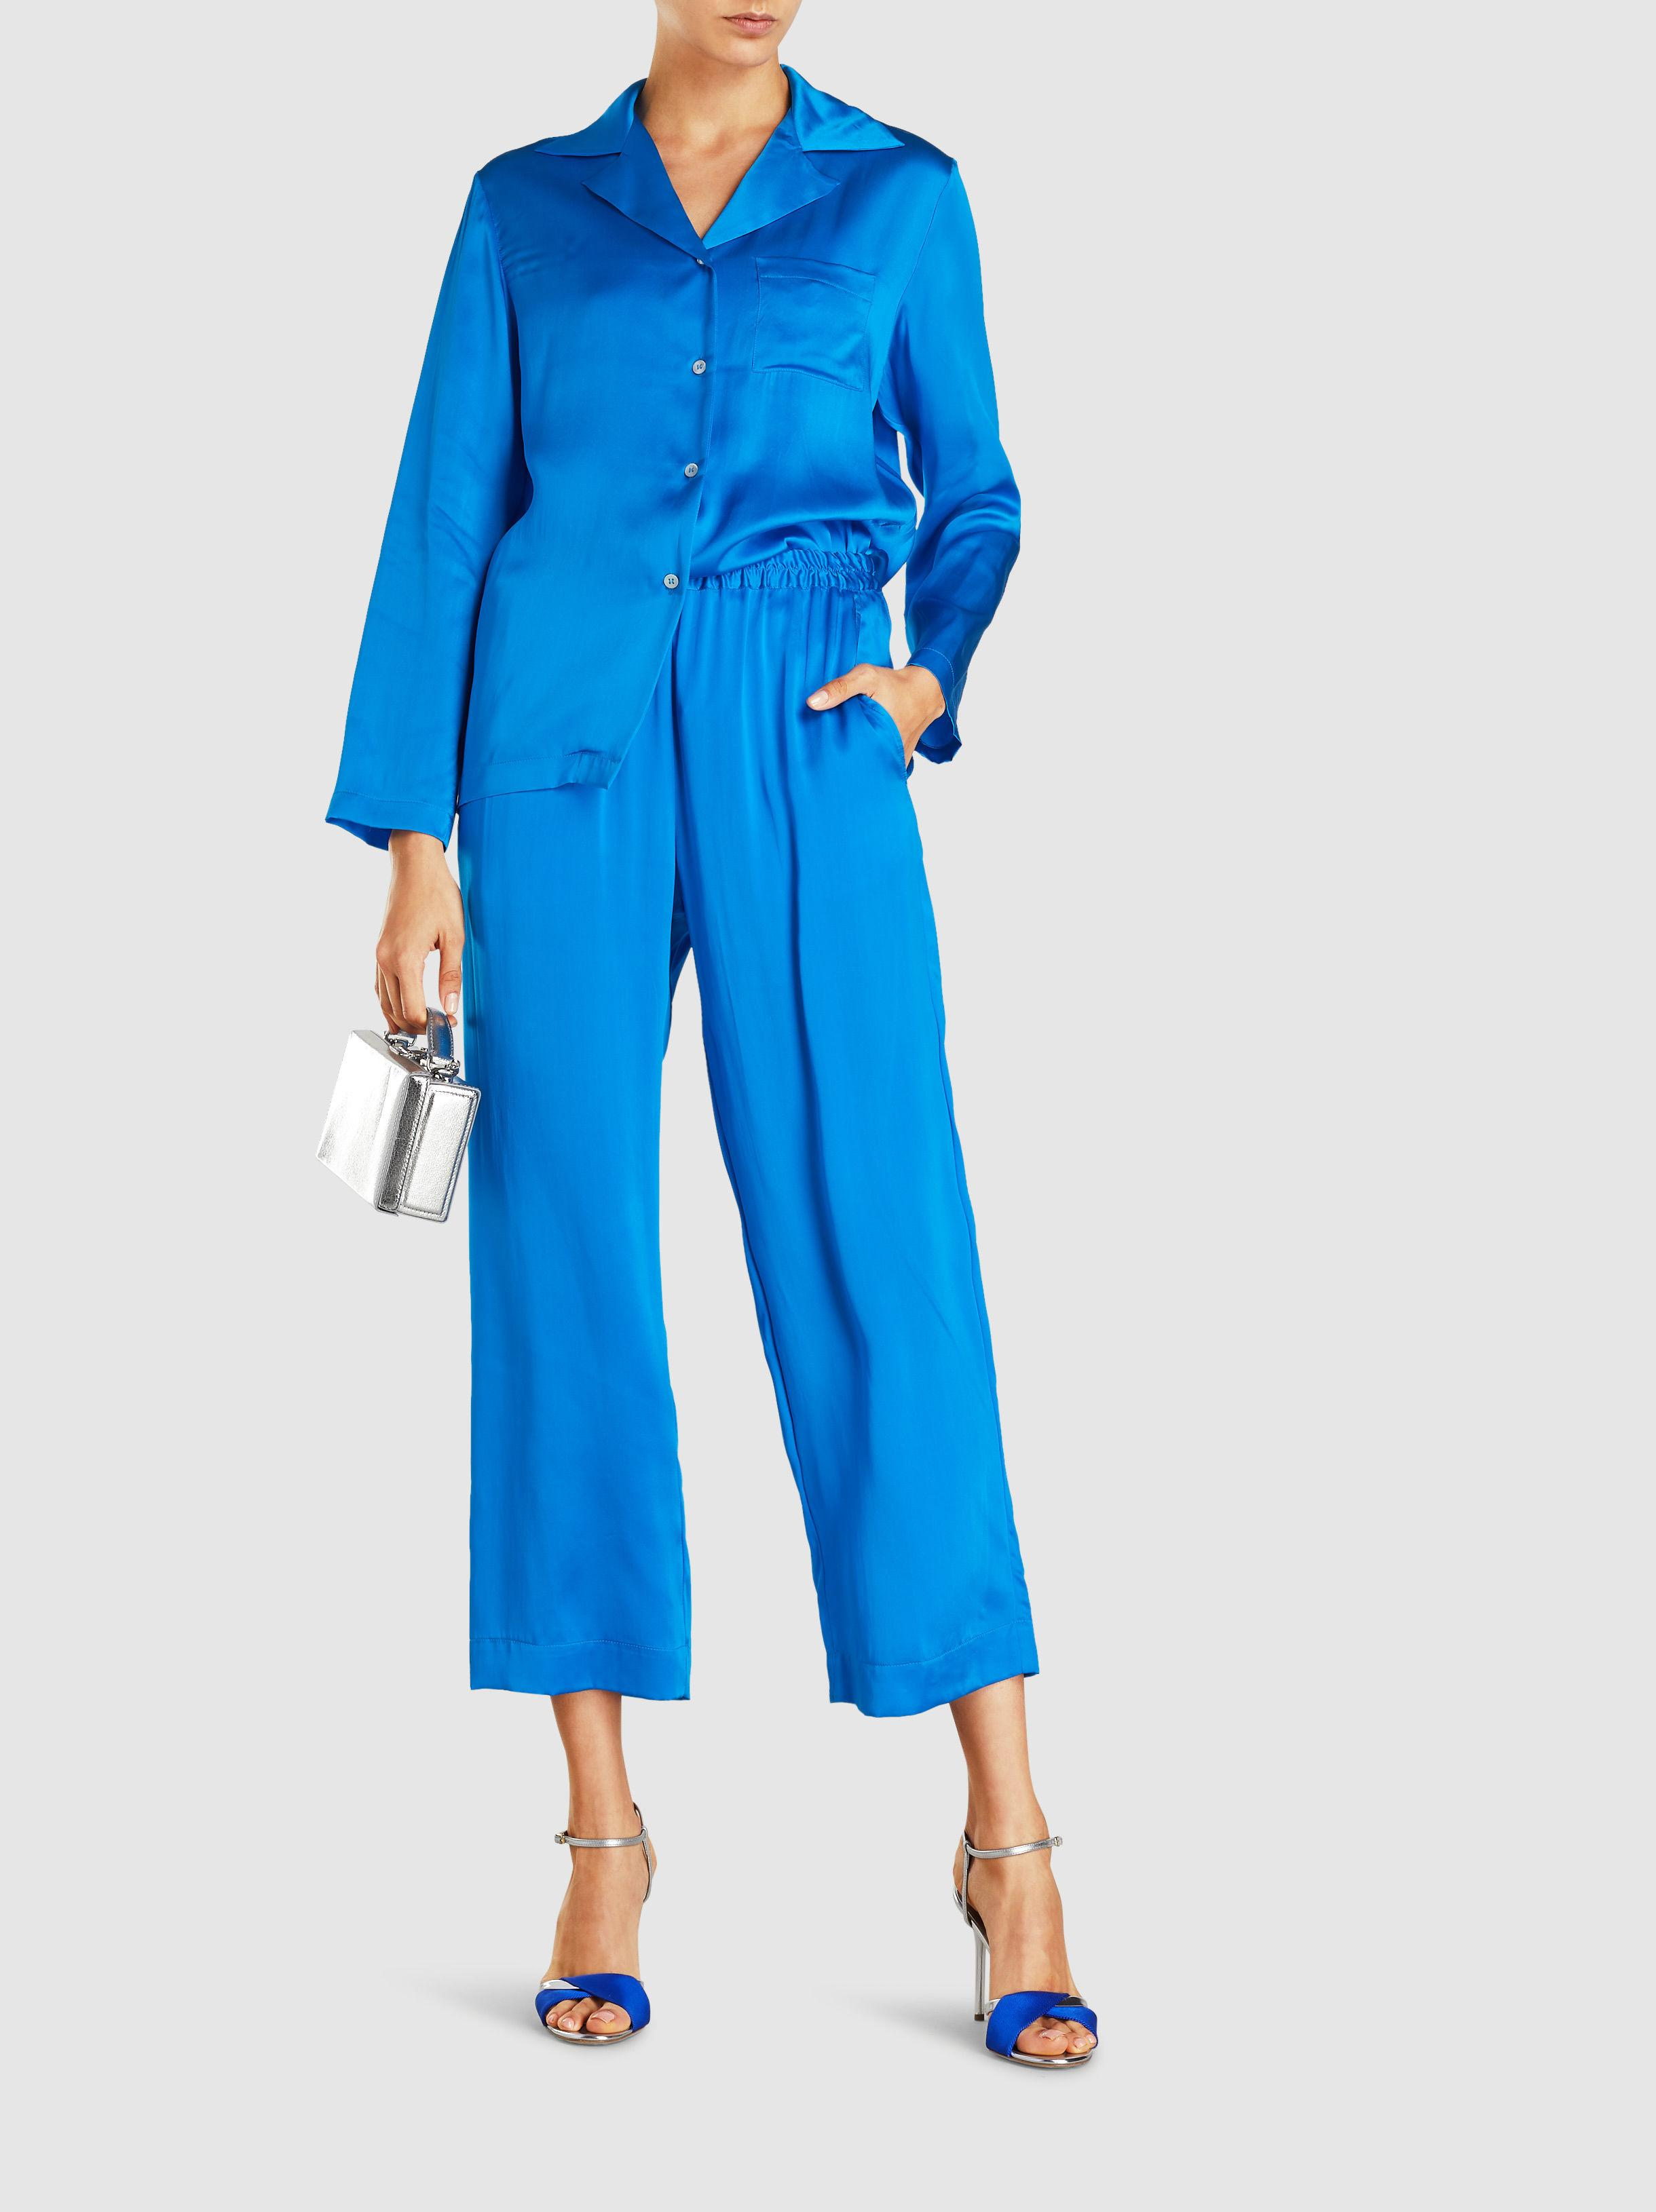 984230fe52ac1 Mansur Gavriel - Blue Pyjama-style Silk Charmeuse Trousers - Lyst. View  fullscreen